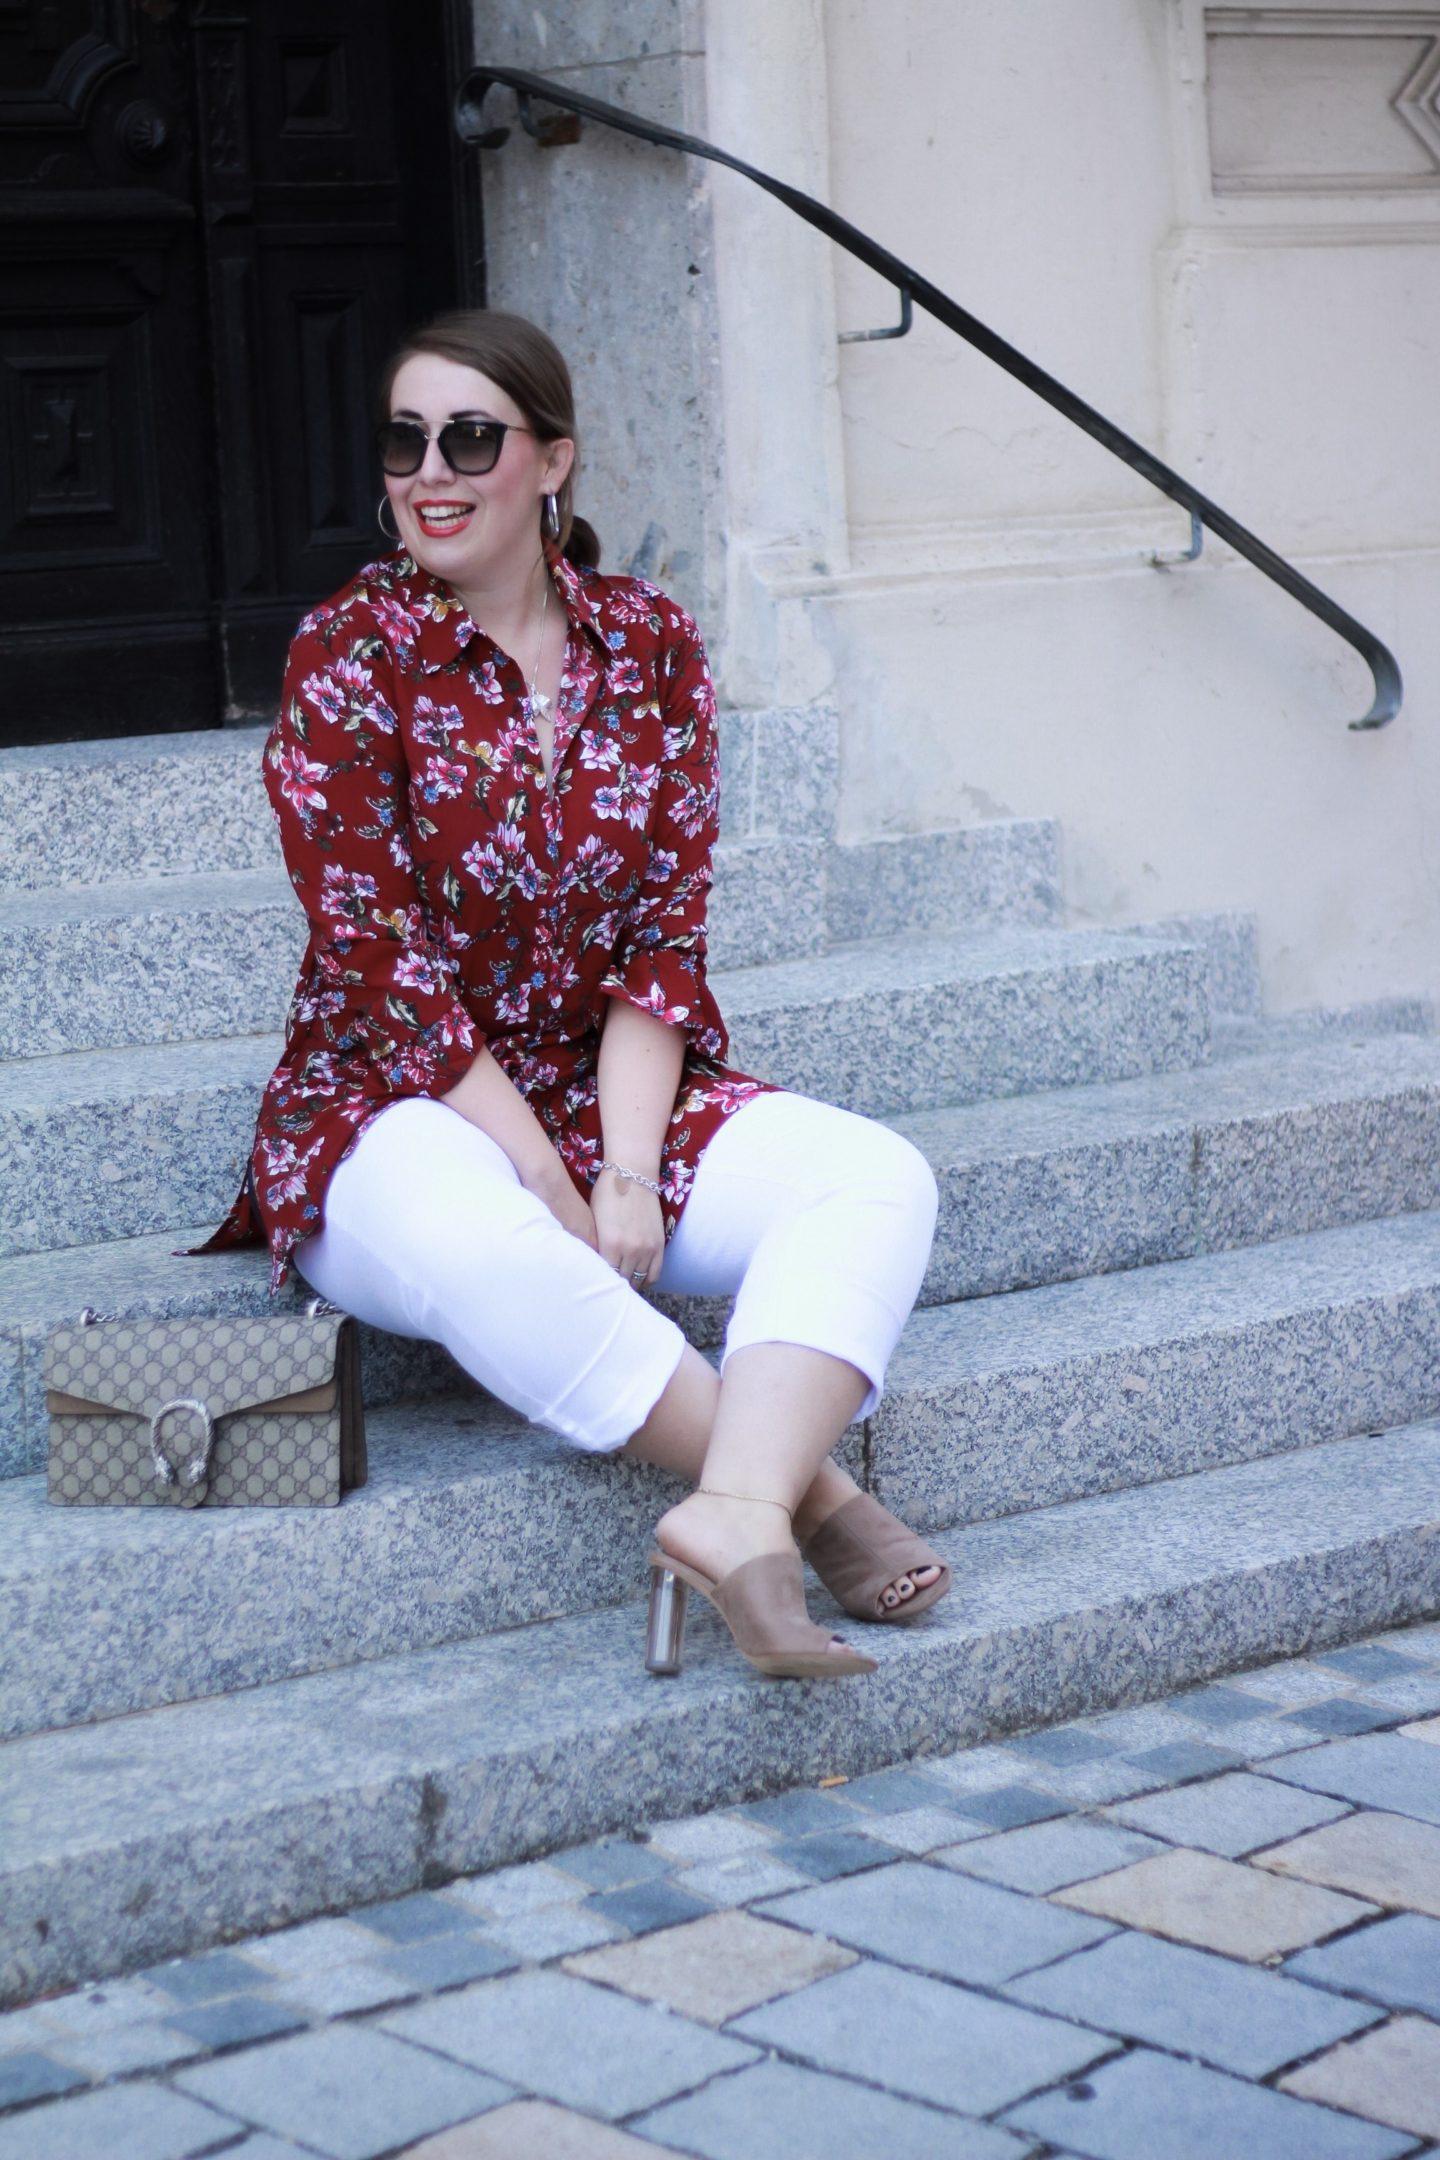 Miss-Suzie-Loves-Sheego-Pantone-Red-Pear-Bordeauxrot-Susanne-Heidebach-Fashionblogger-Gucci-Dioynsus-Curvy-Model